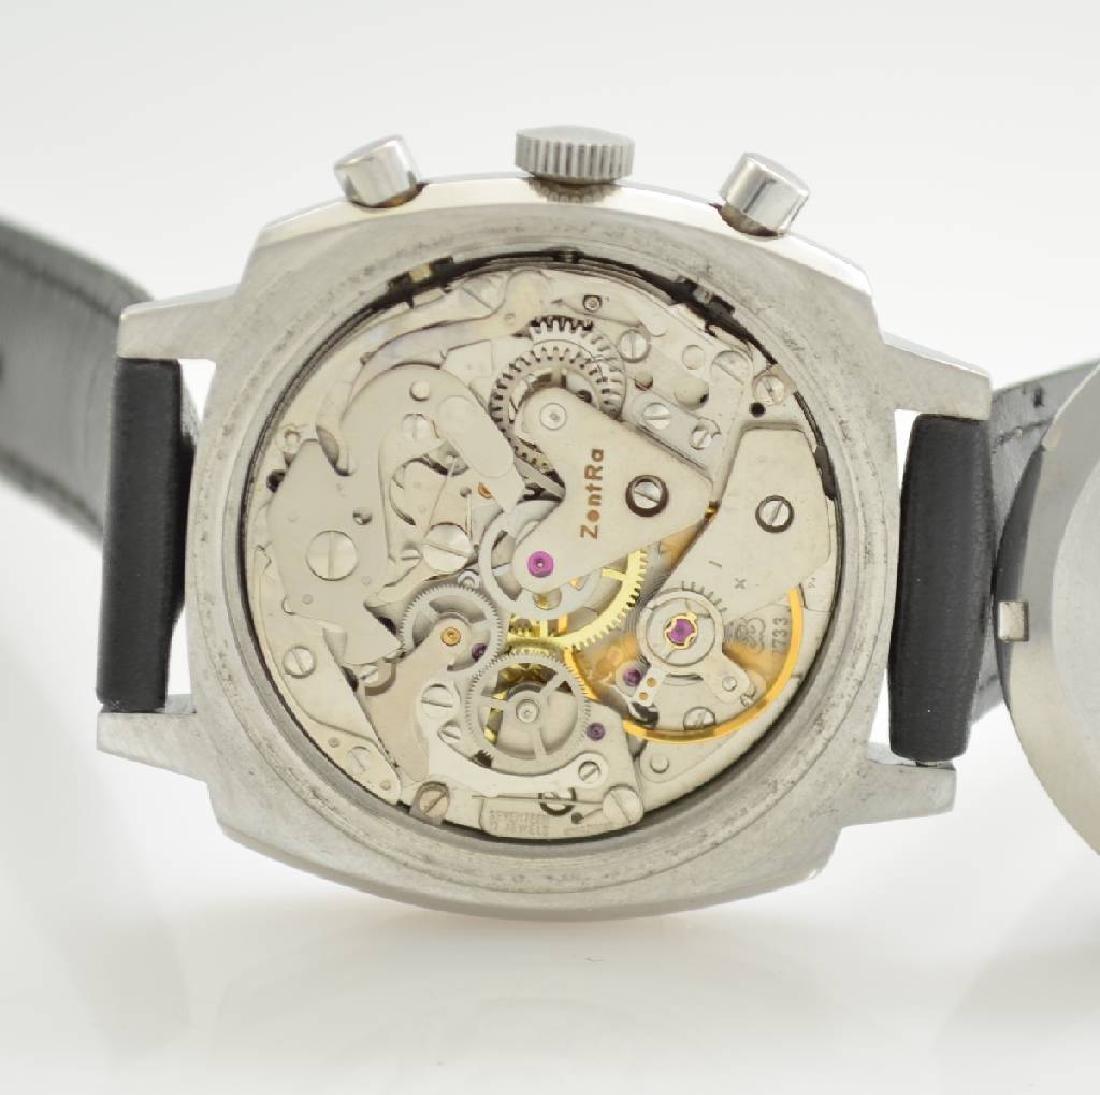 ZENTRA chronograph, Switzerland around 1970 - 8